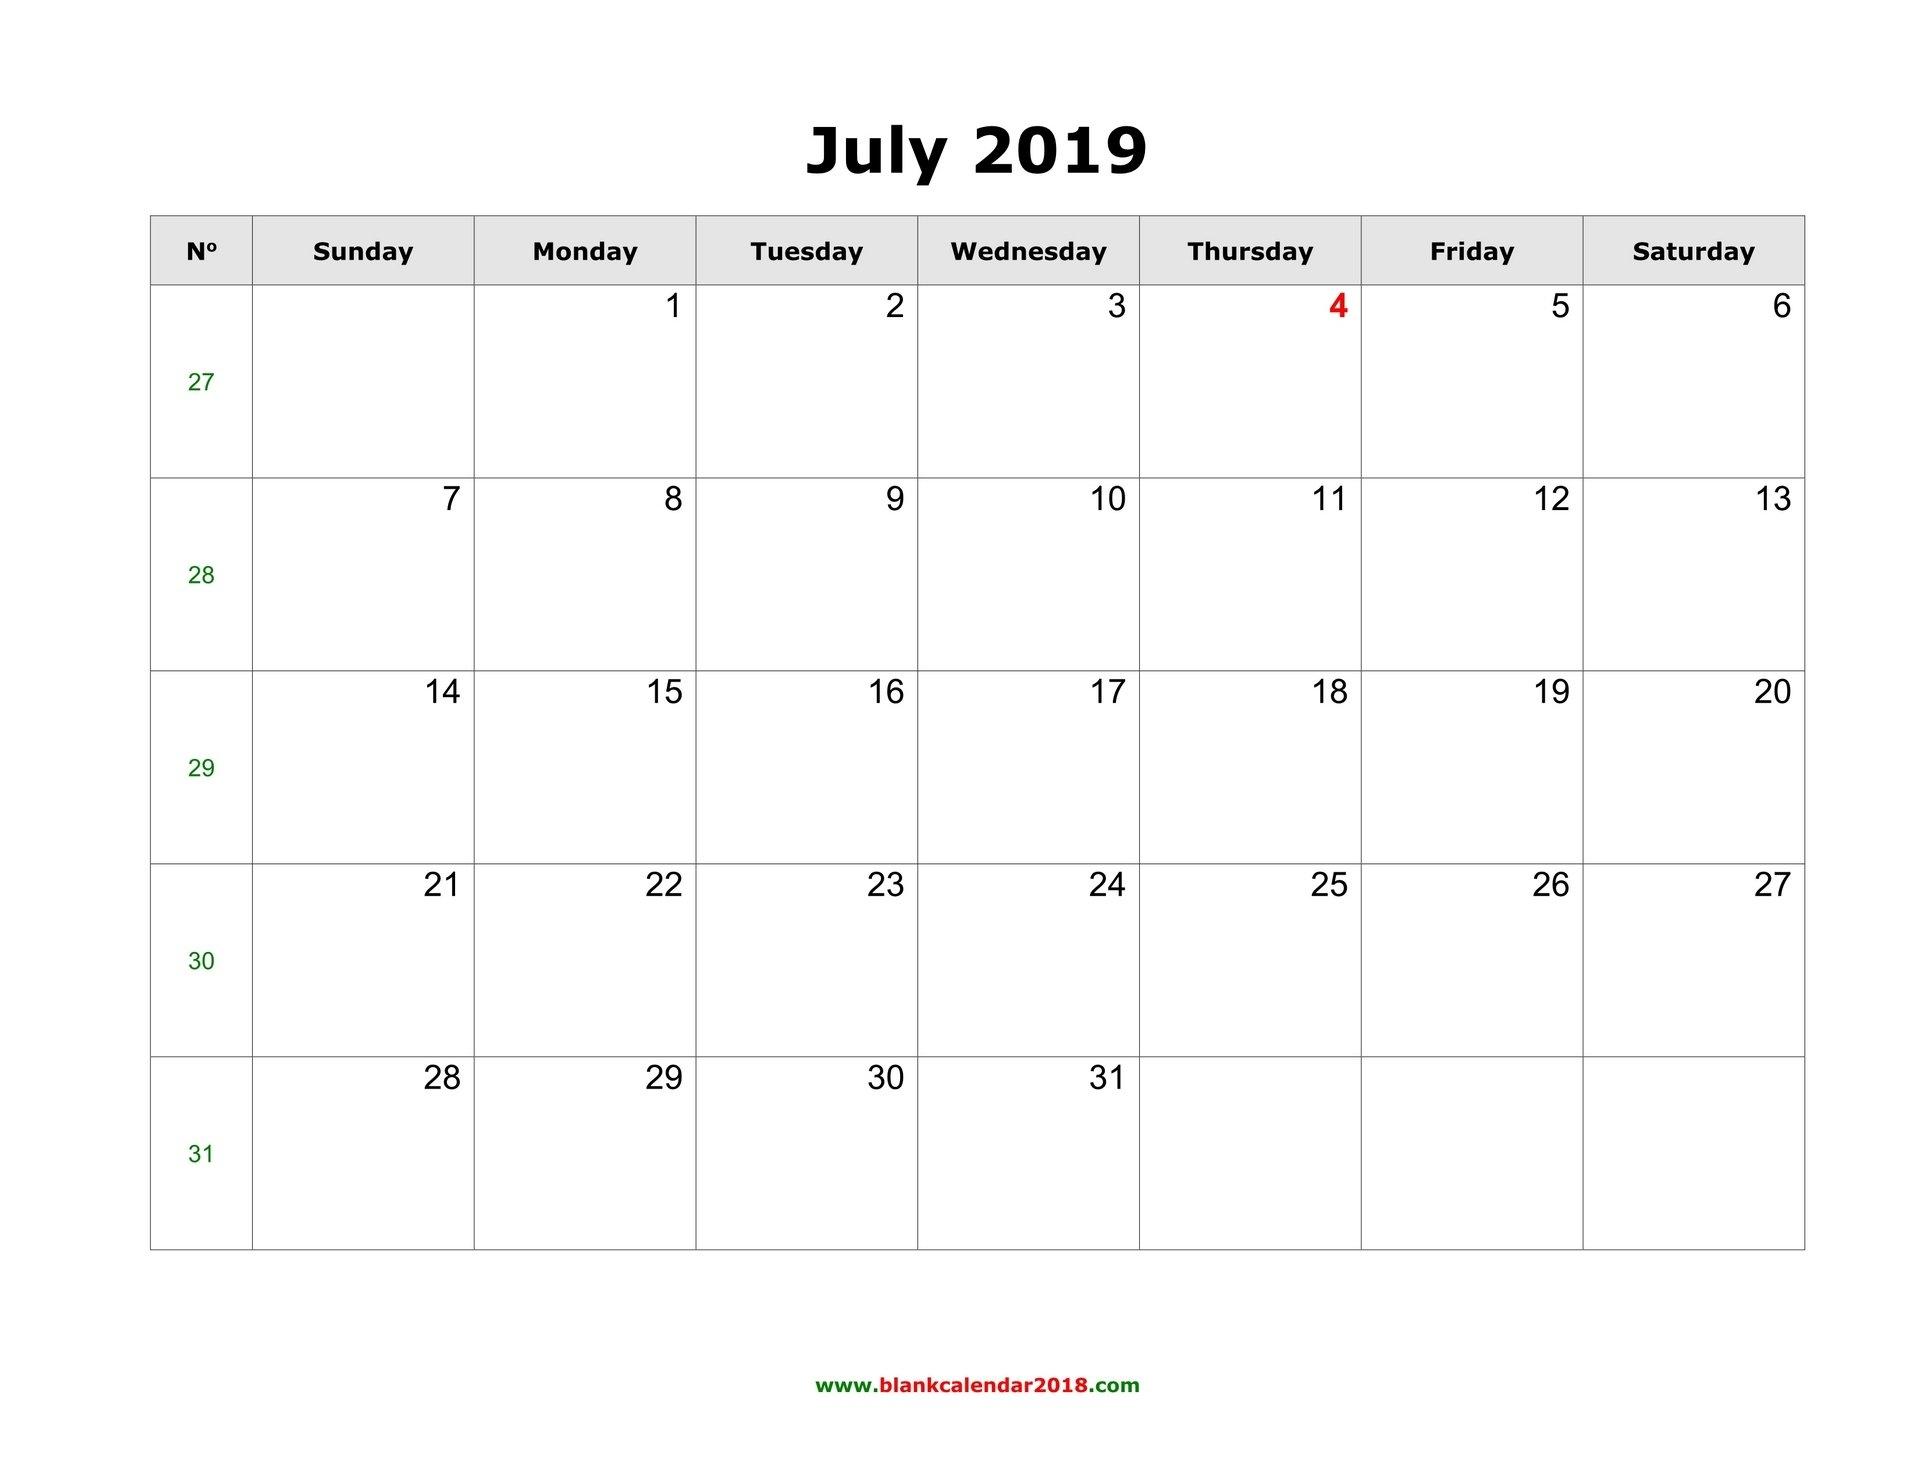 Blank Calendar For July 2019 Calendar Of 2019 July